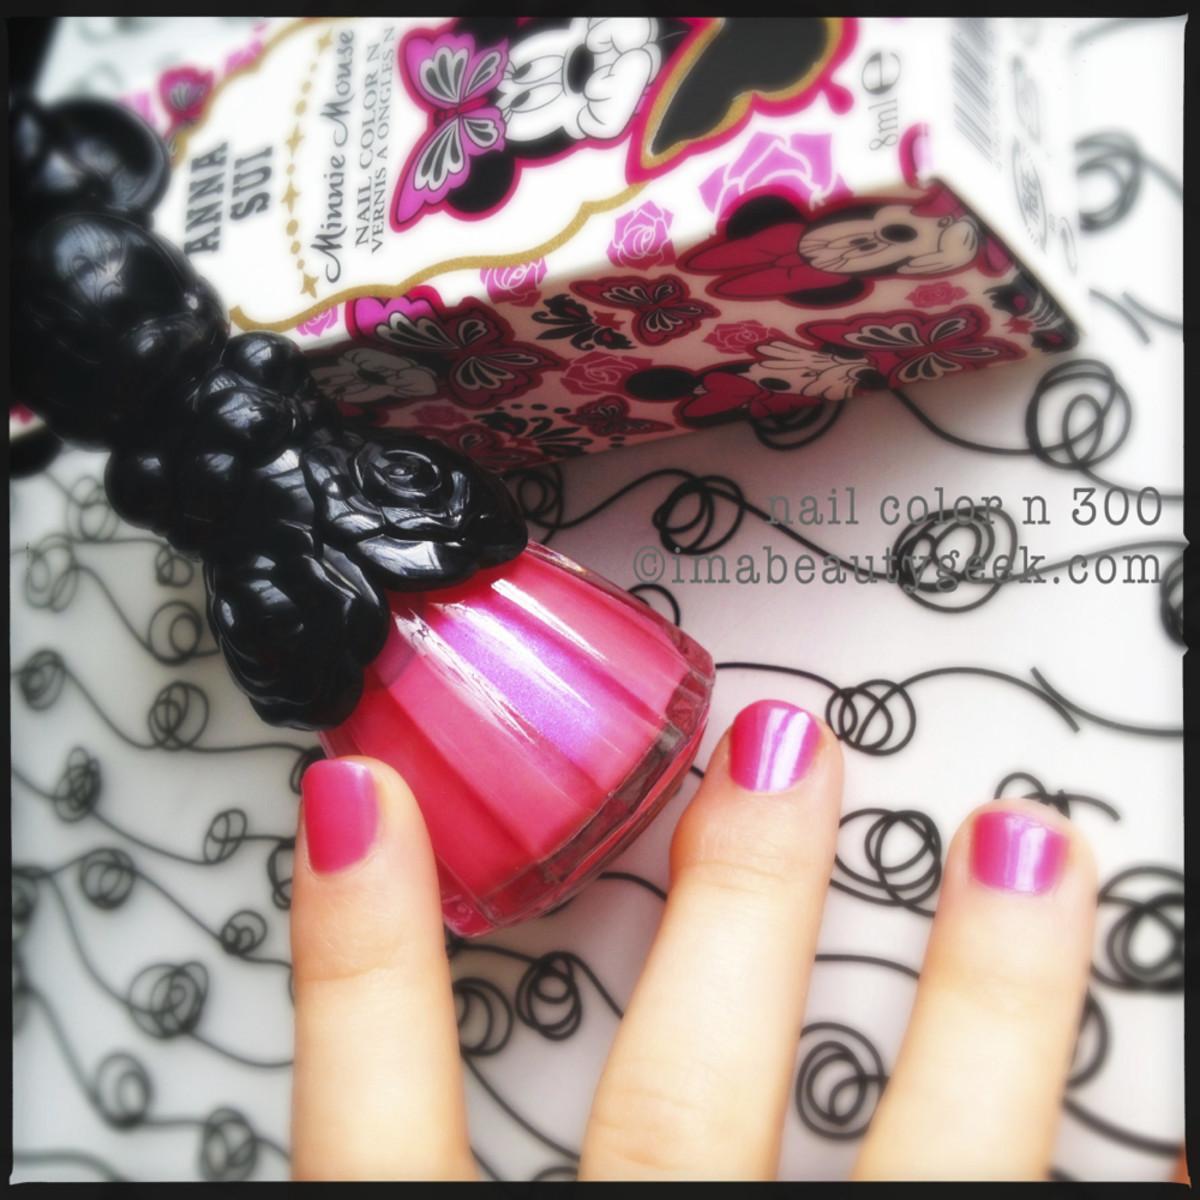 Anna Sui Minnie Mouse nail polish